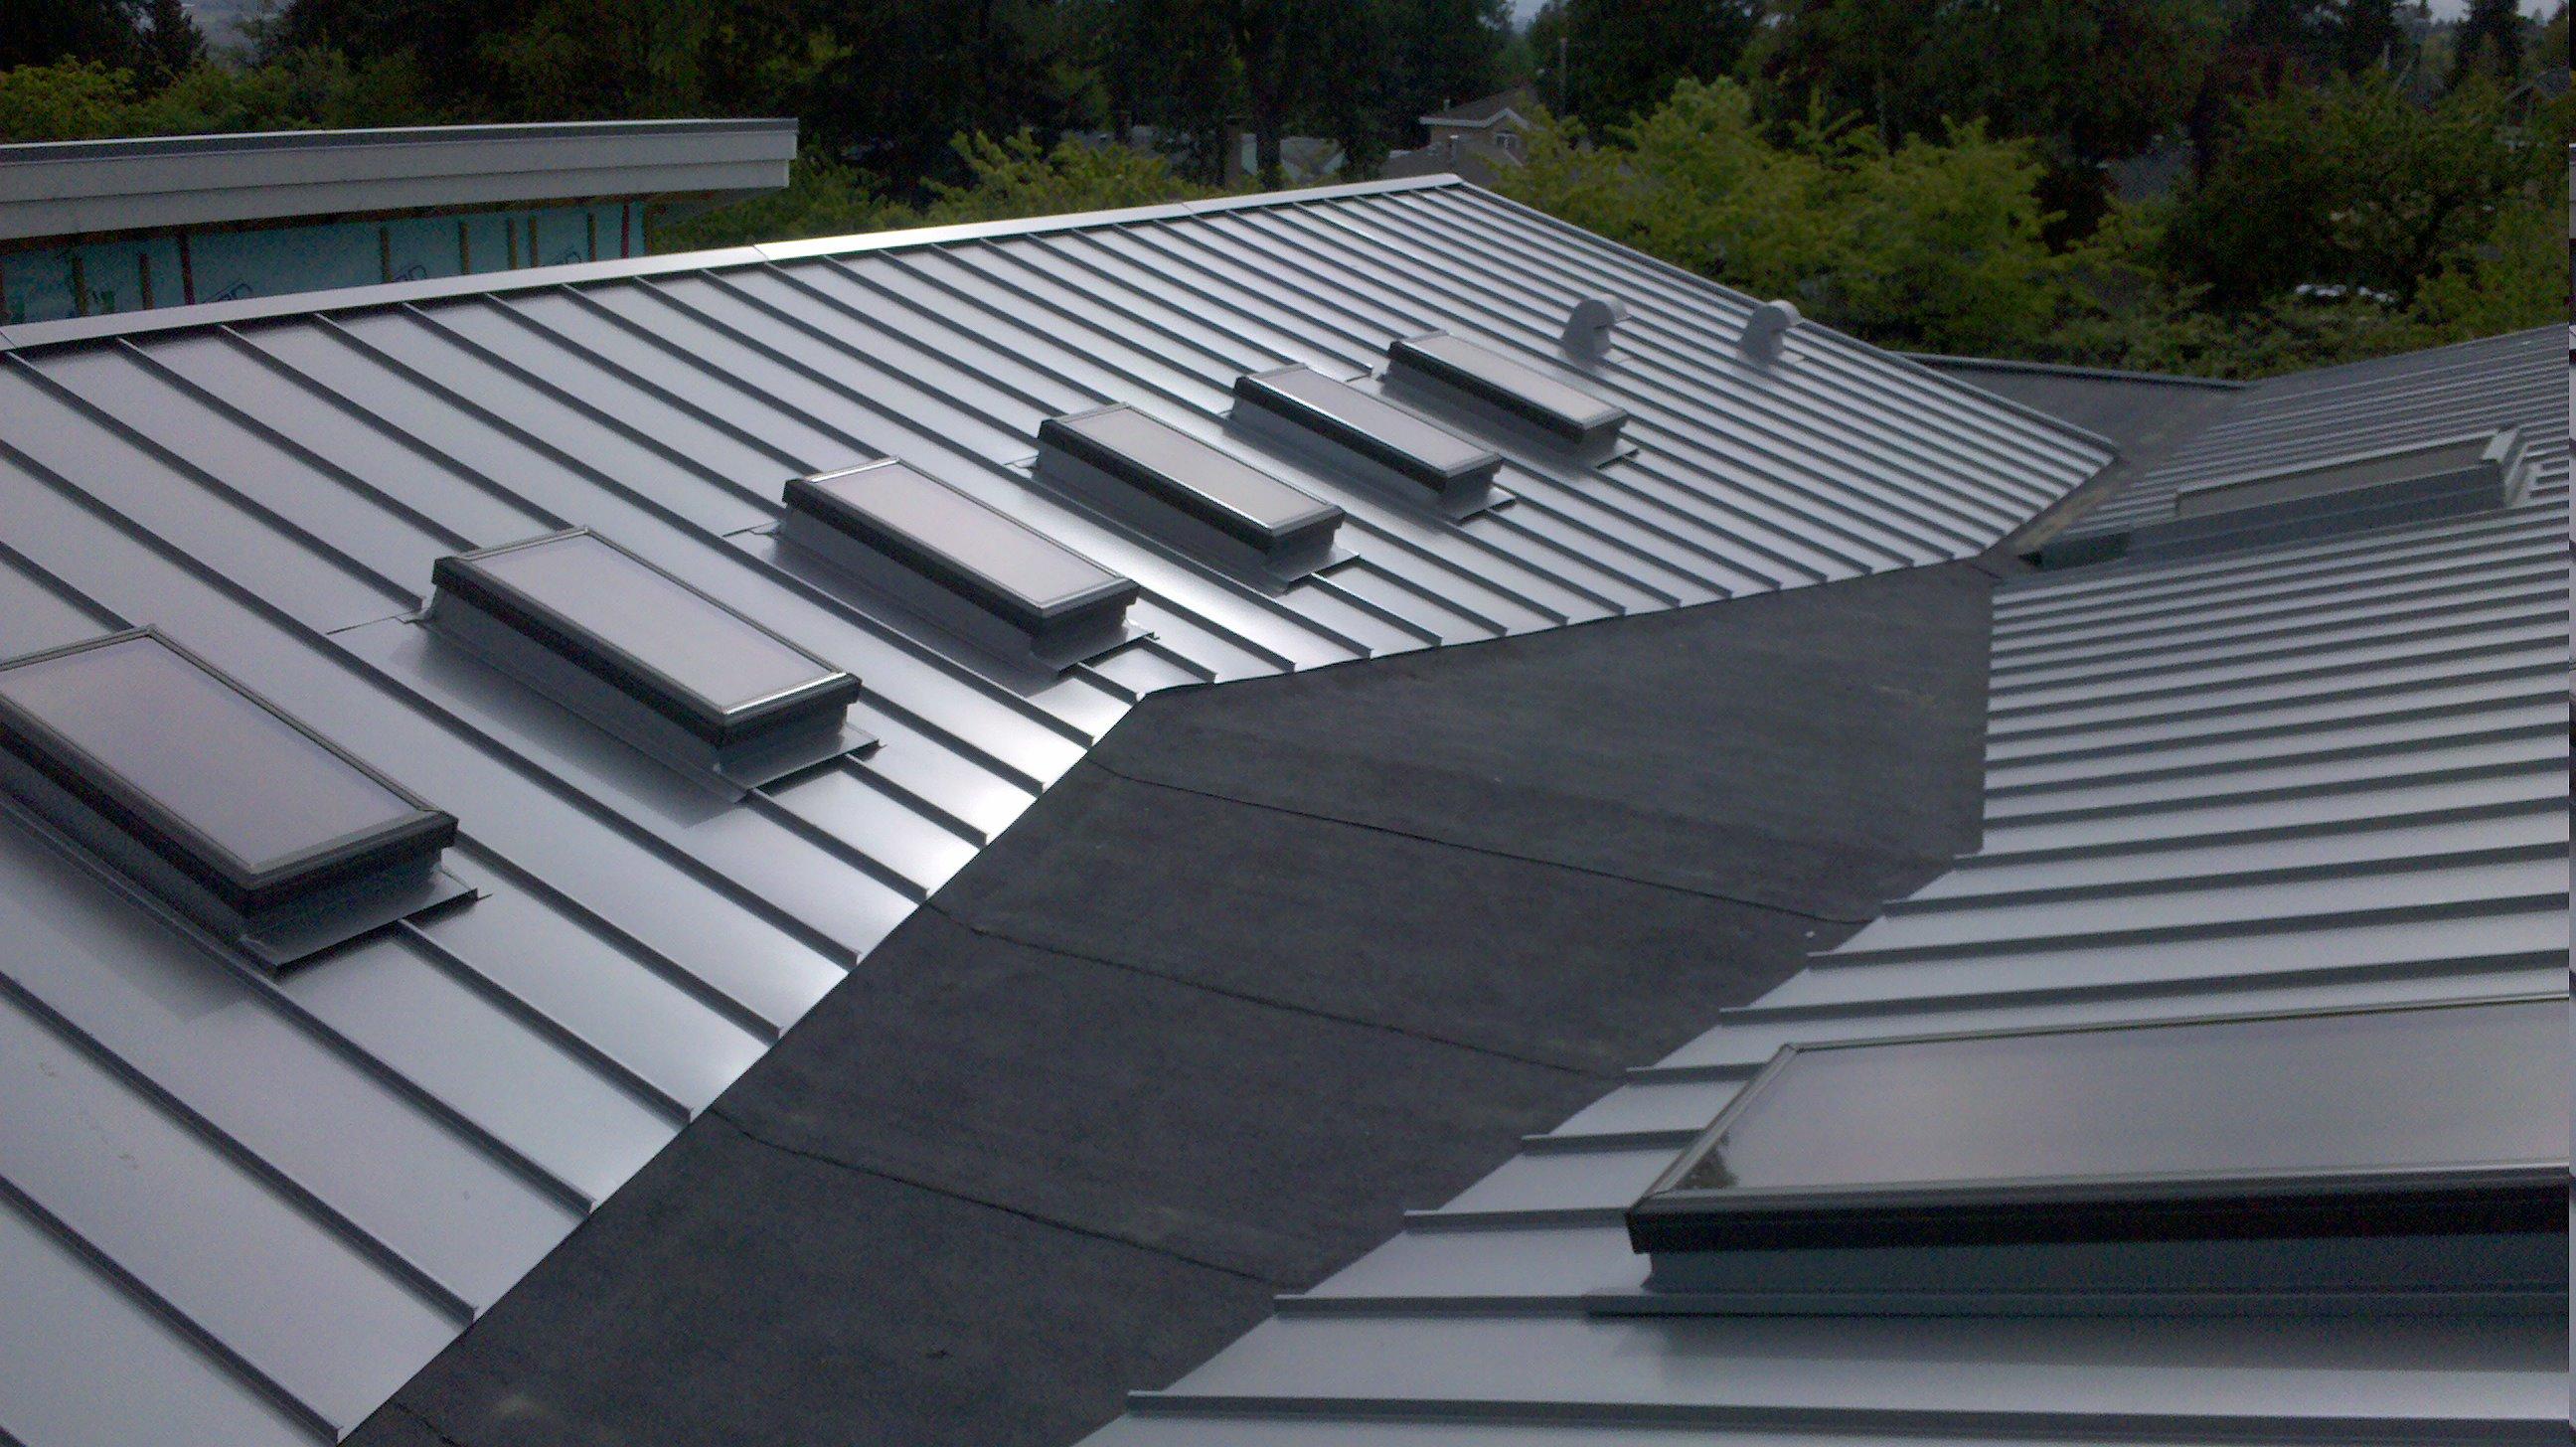 Metal Roofing Services Torontoroofing Ca